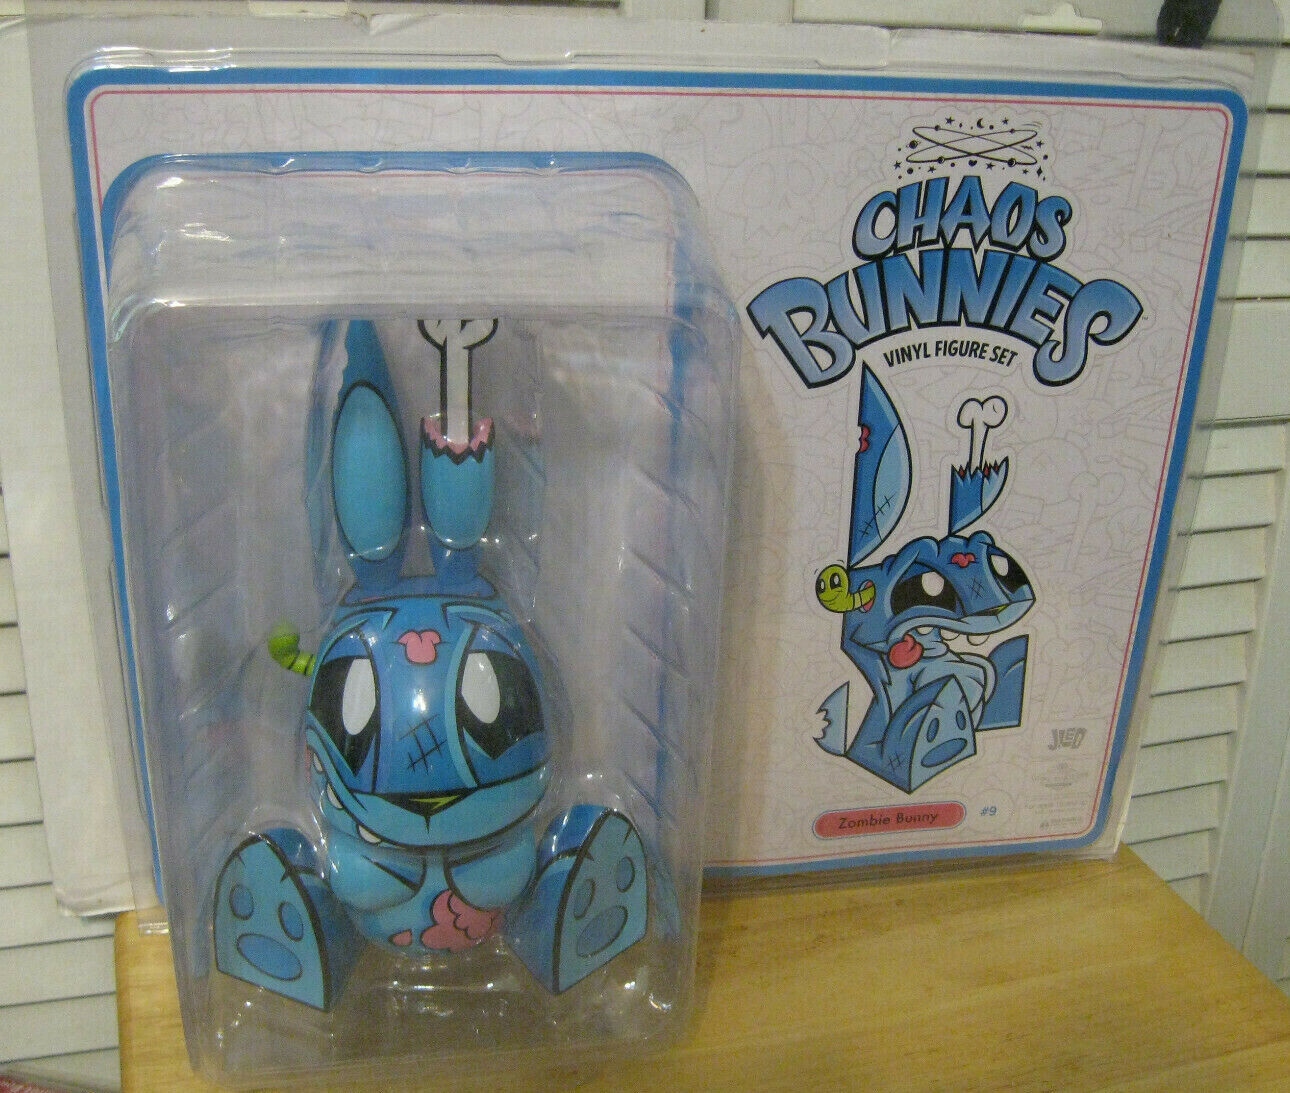 Loyal Subjects 10  Chaos Bunnies   09 Zombie Bunny Vinyl cifra Joe Ledbetter  più economico